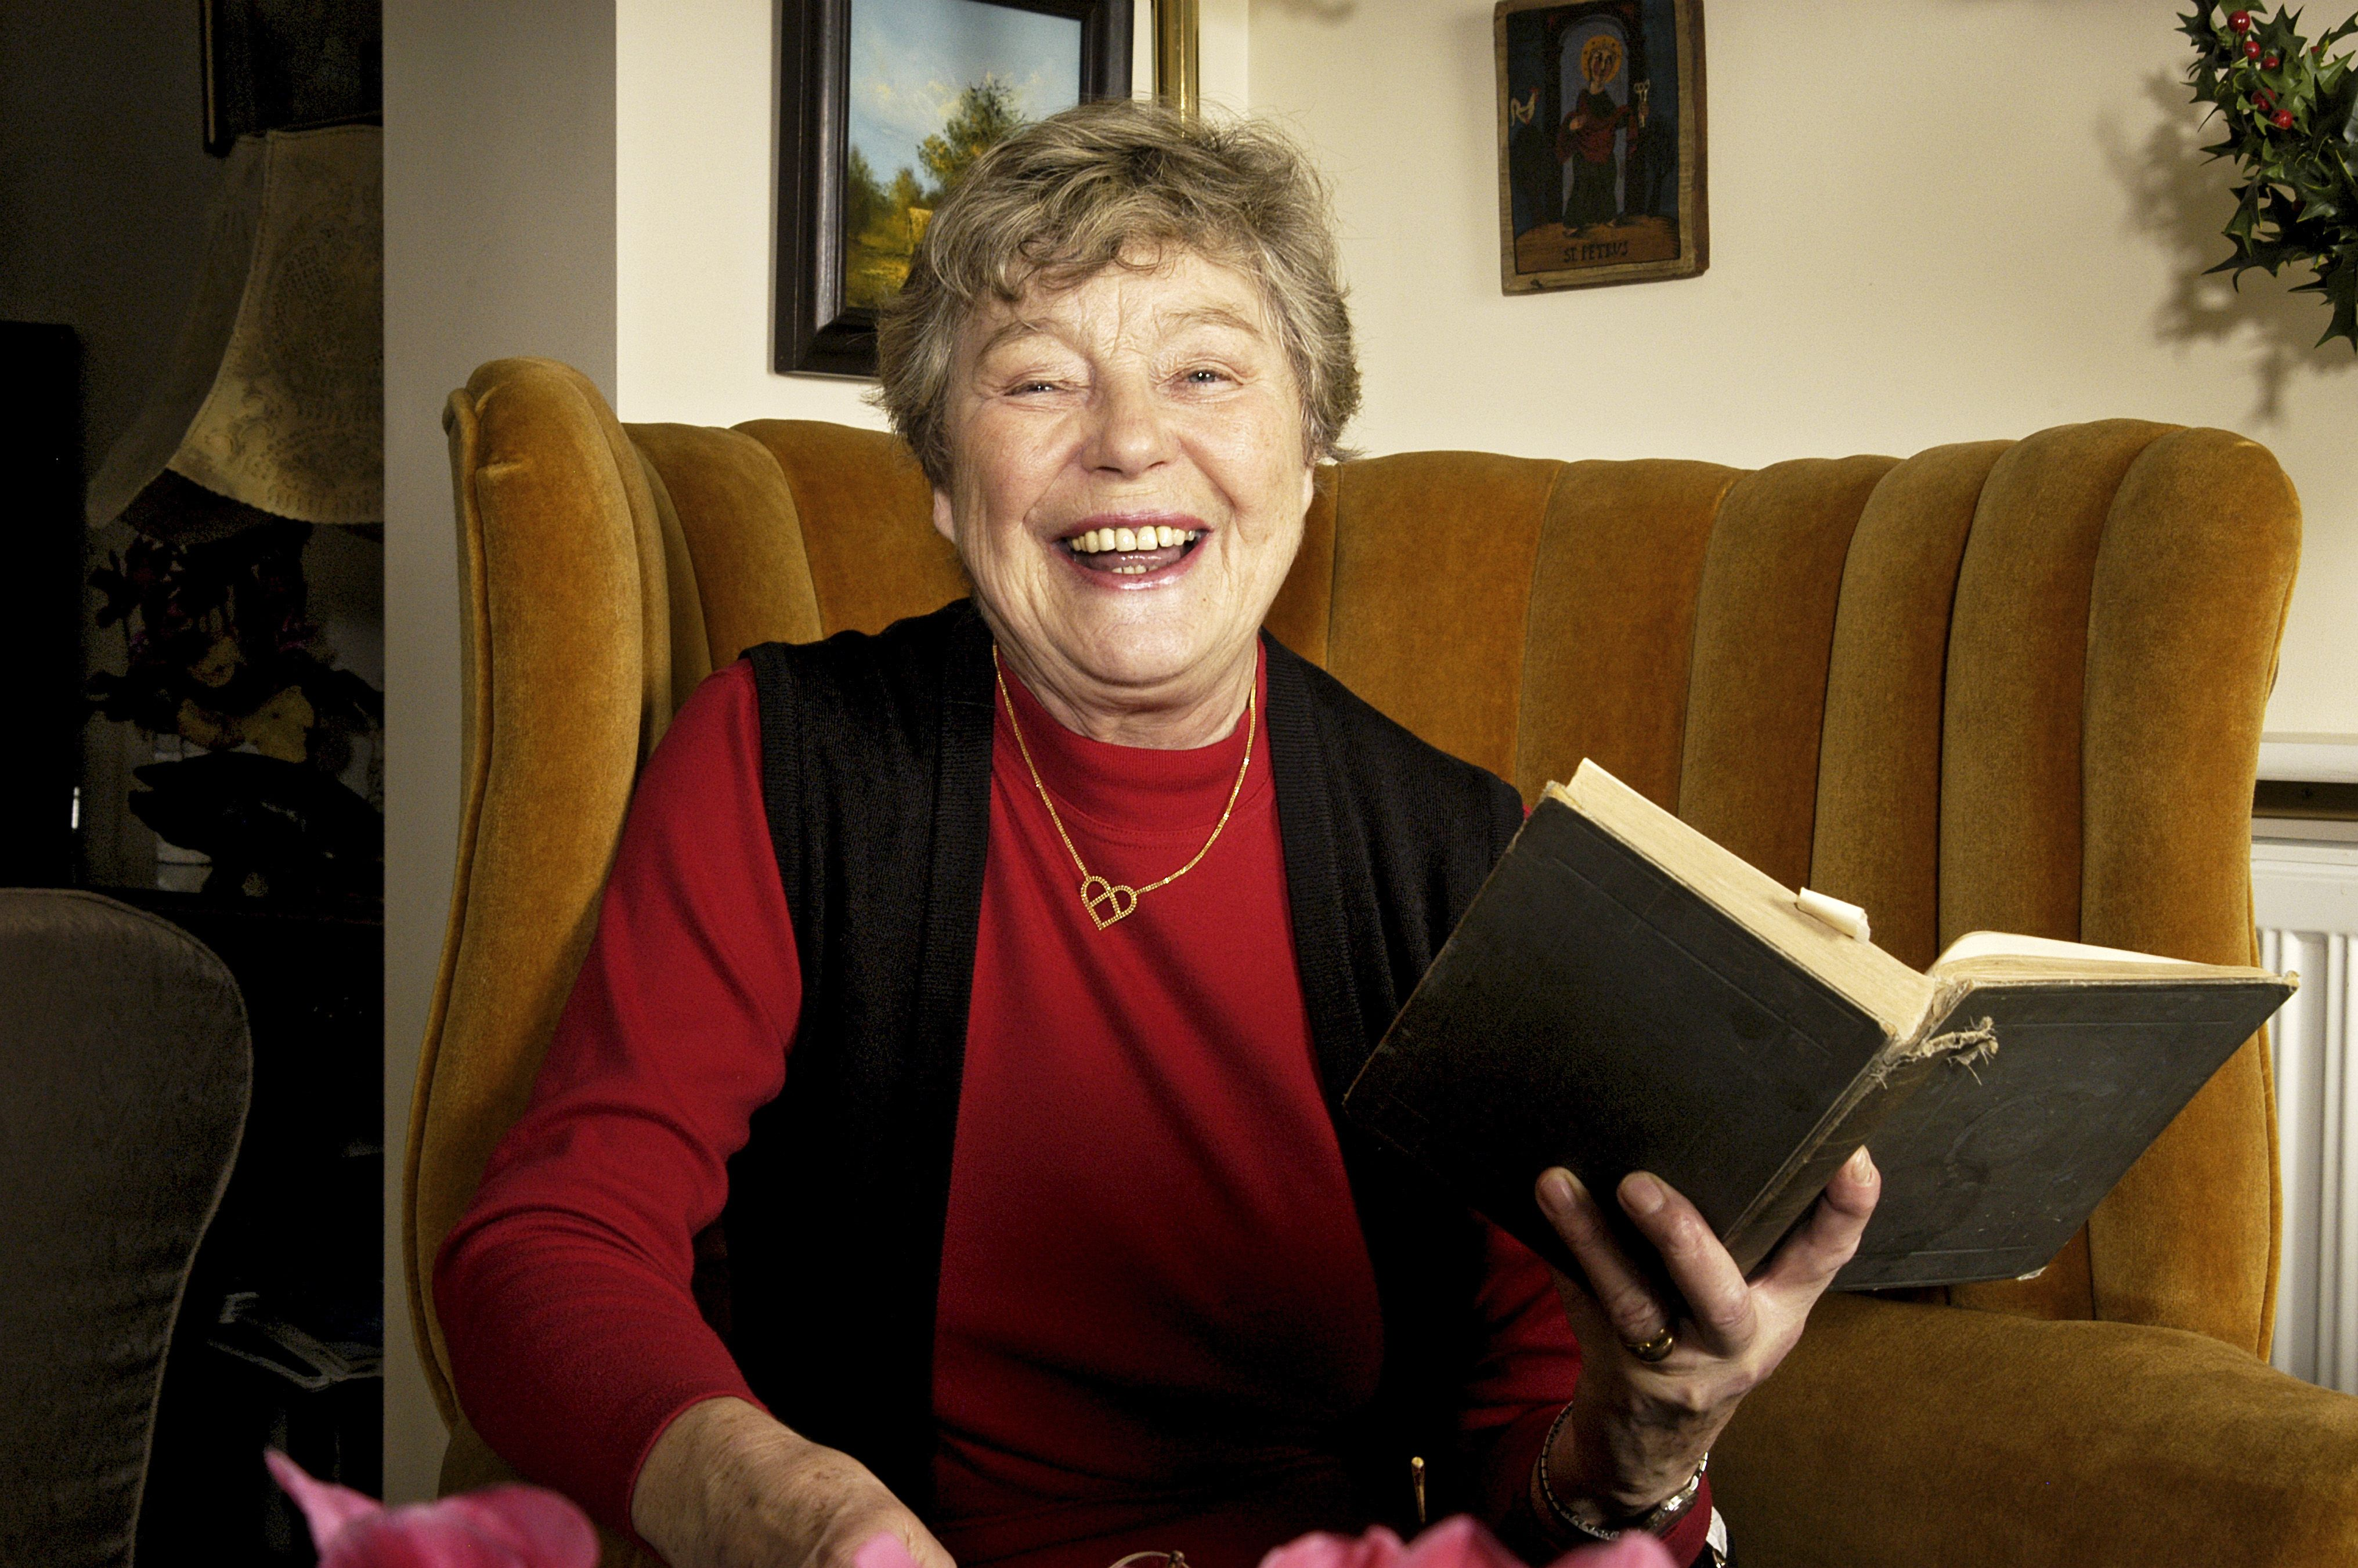 Watch Rosemary Leach video